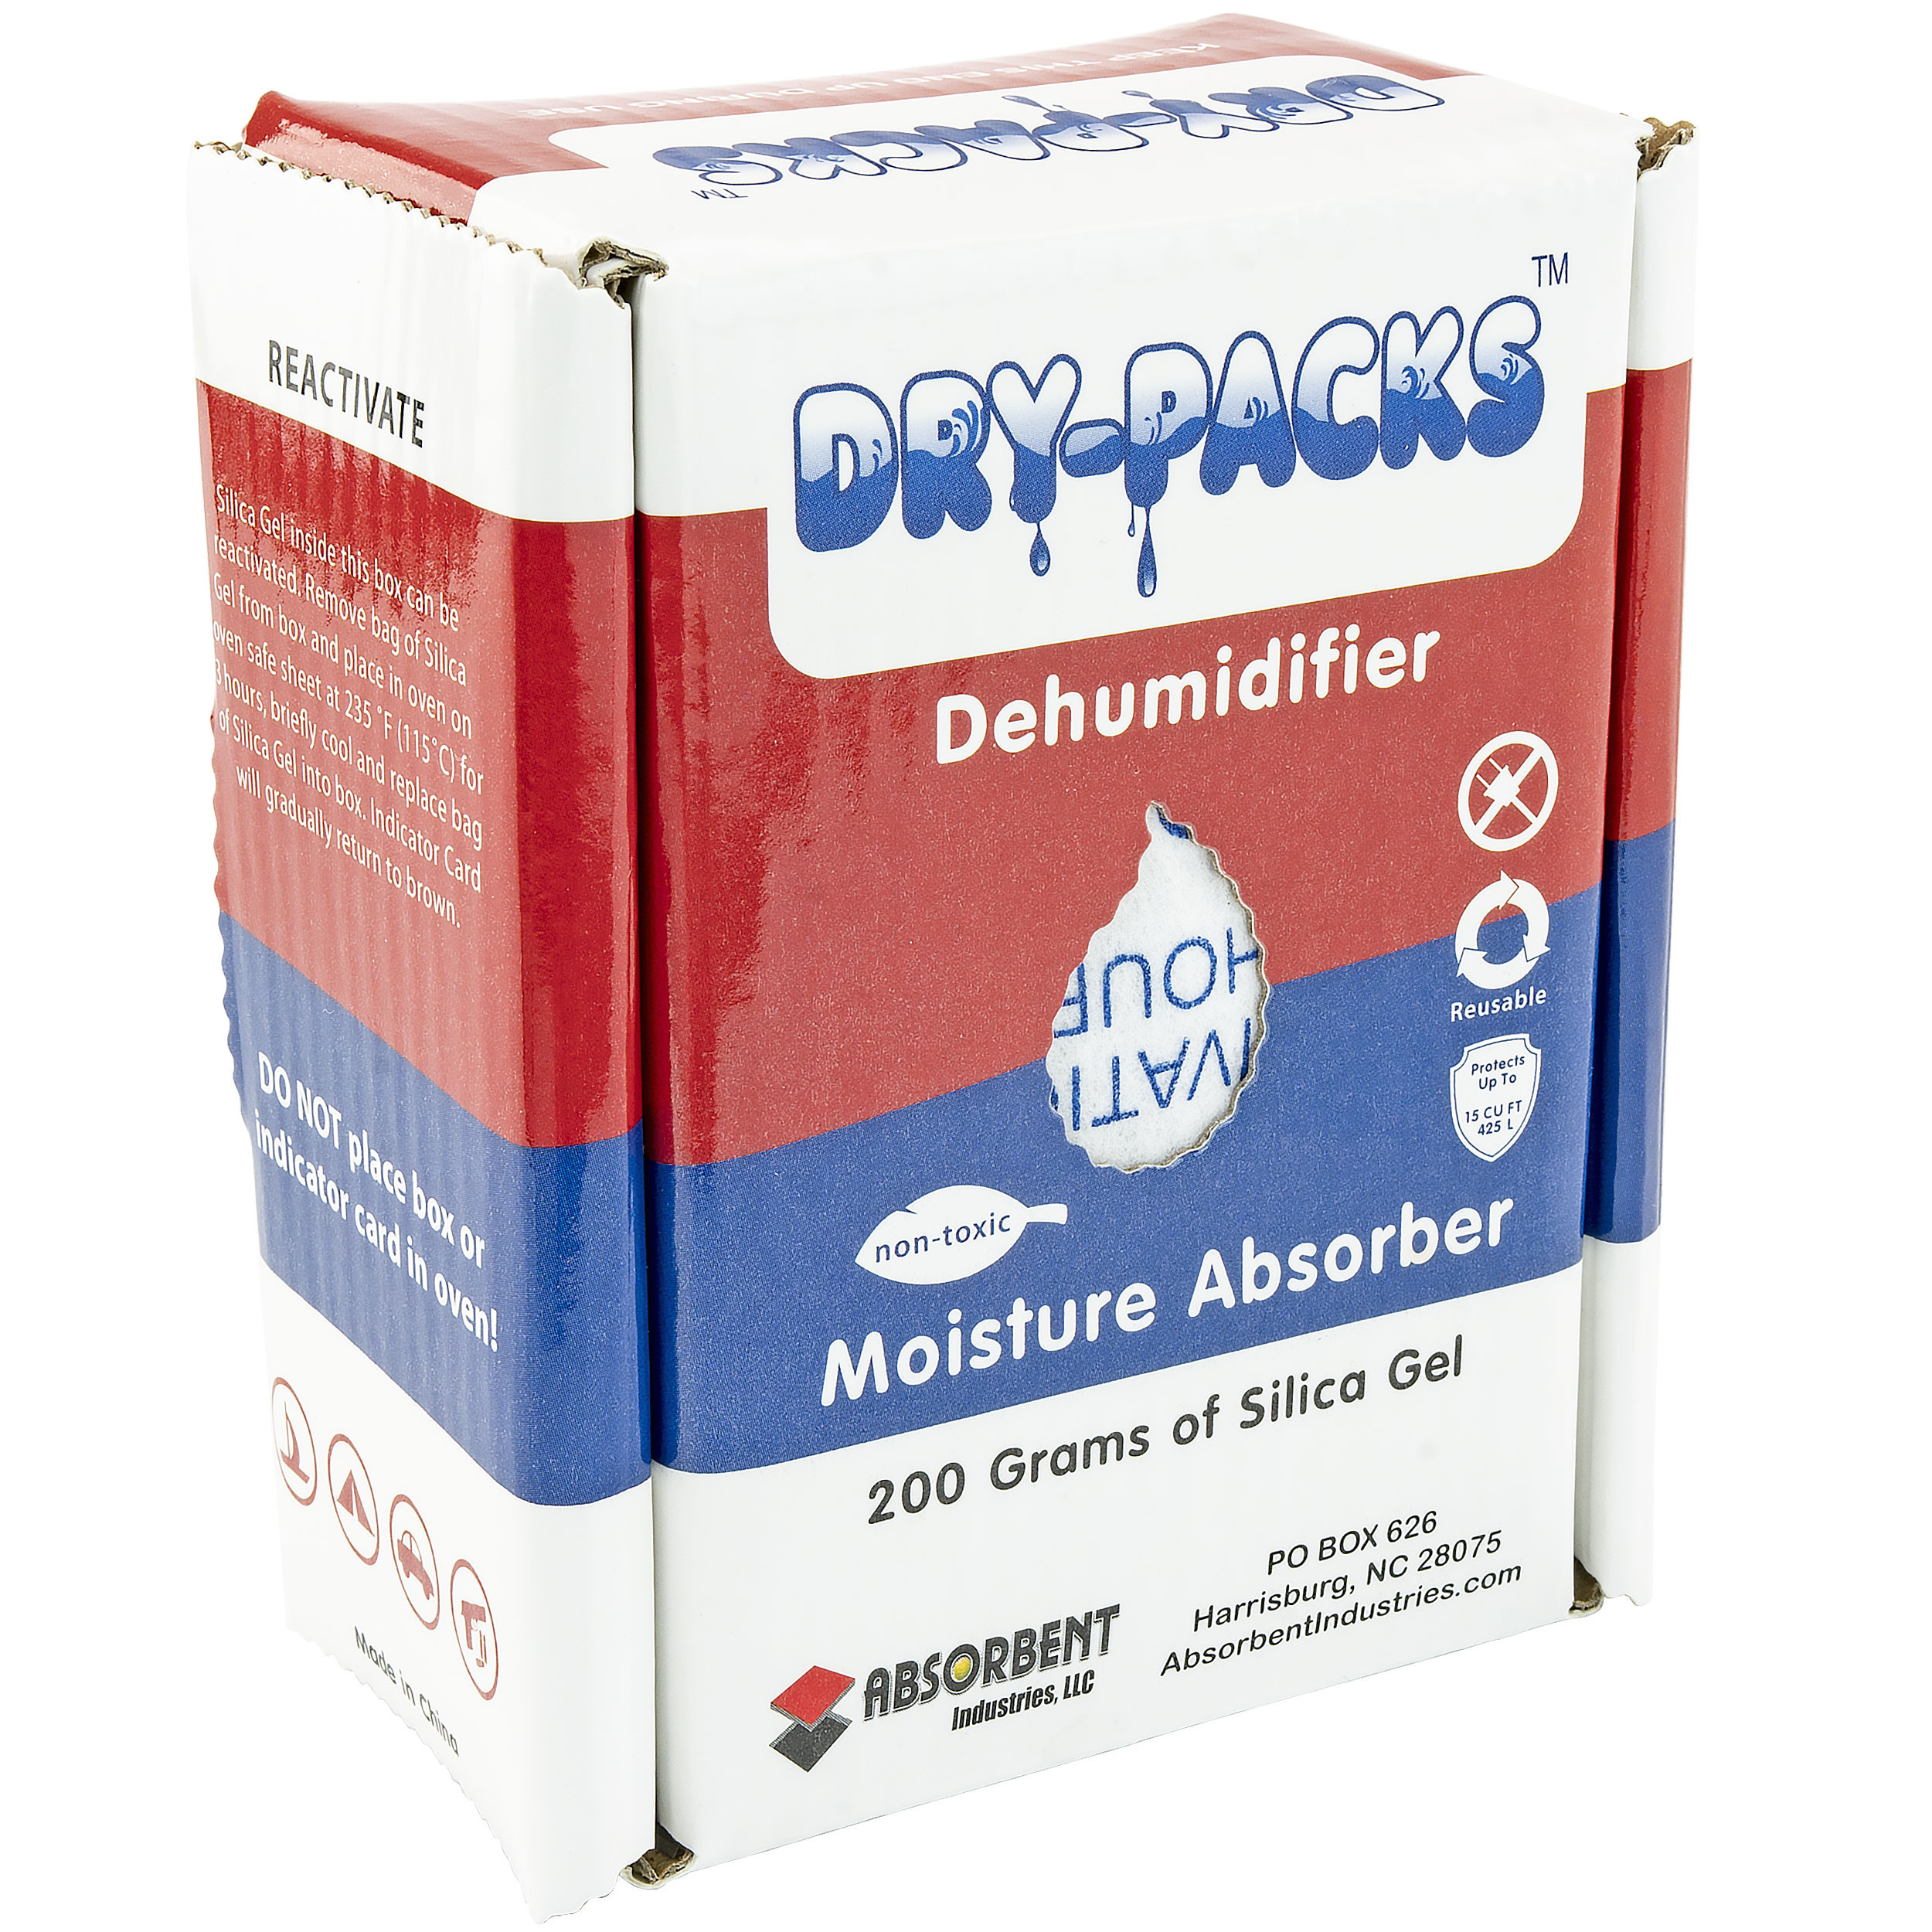 200 Gram Silica Gel Dehumidifying Box by Dry-Packs - Protects 15 Cubic Feet